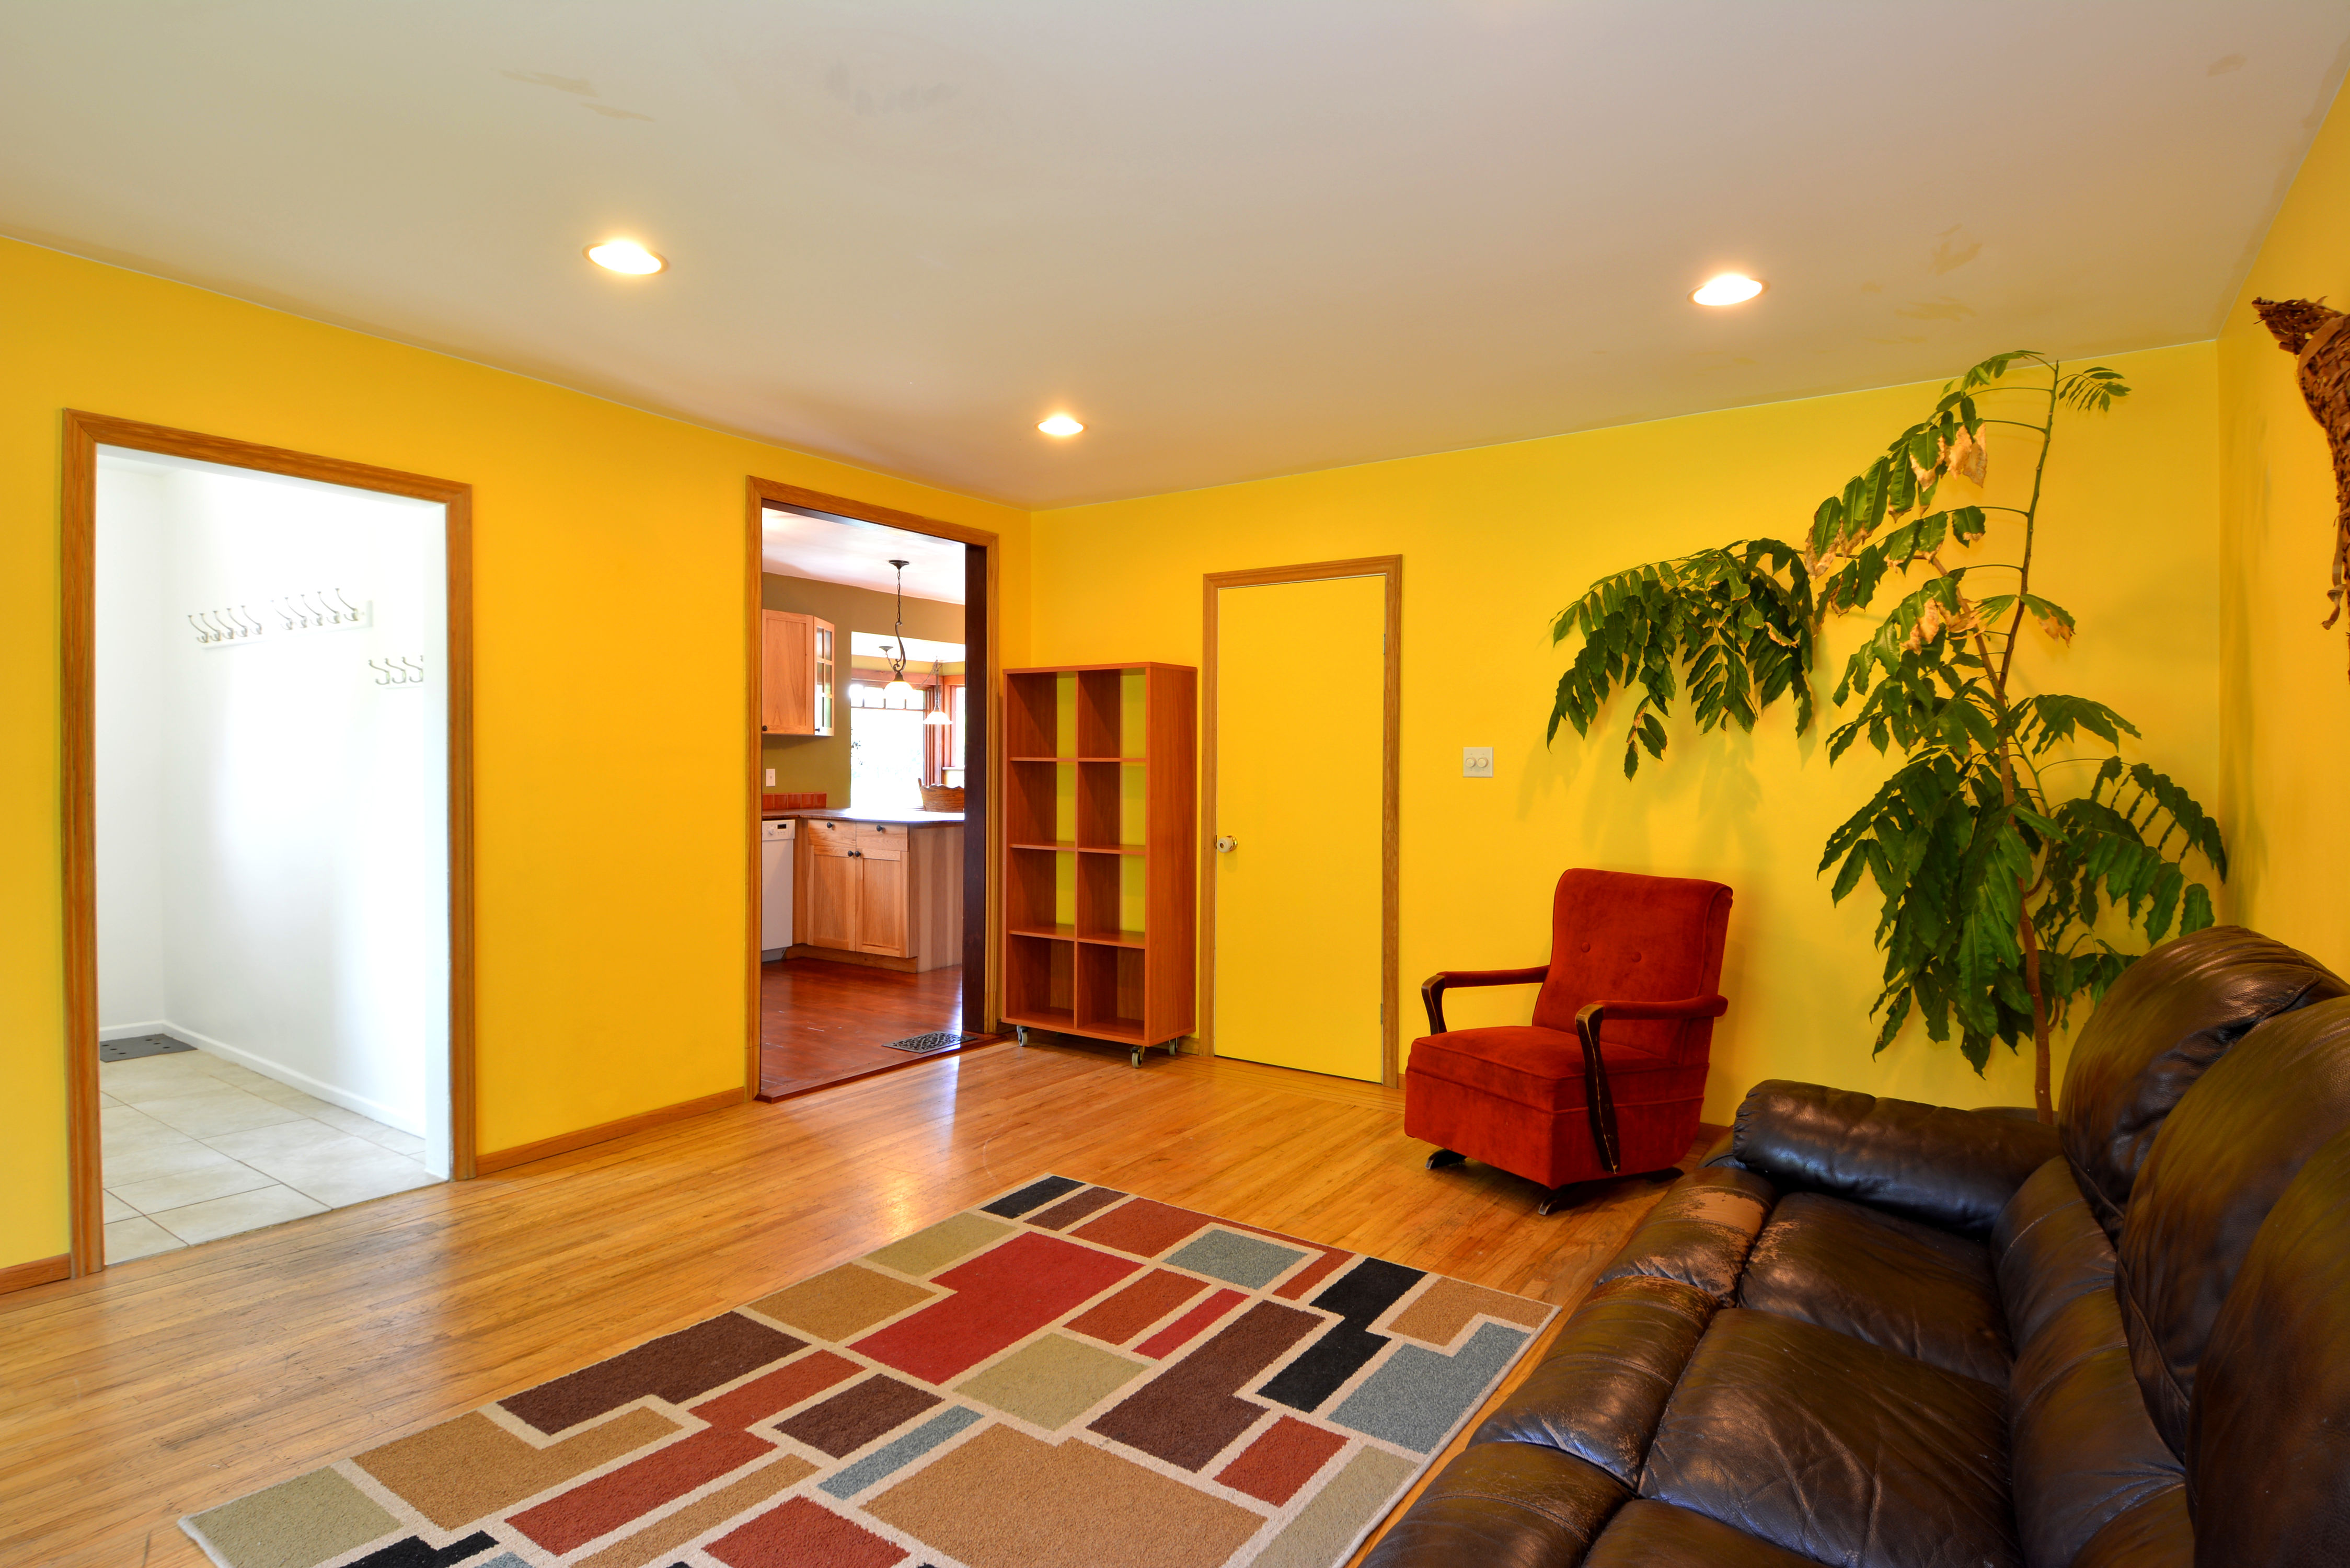 Living Room: 17' x 9'